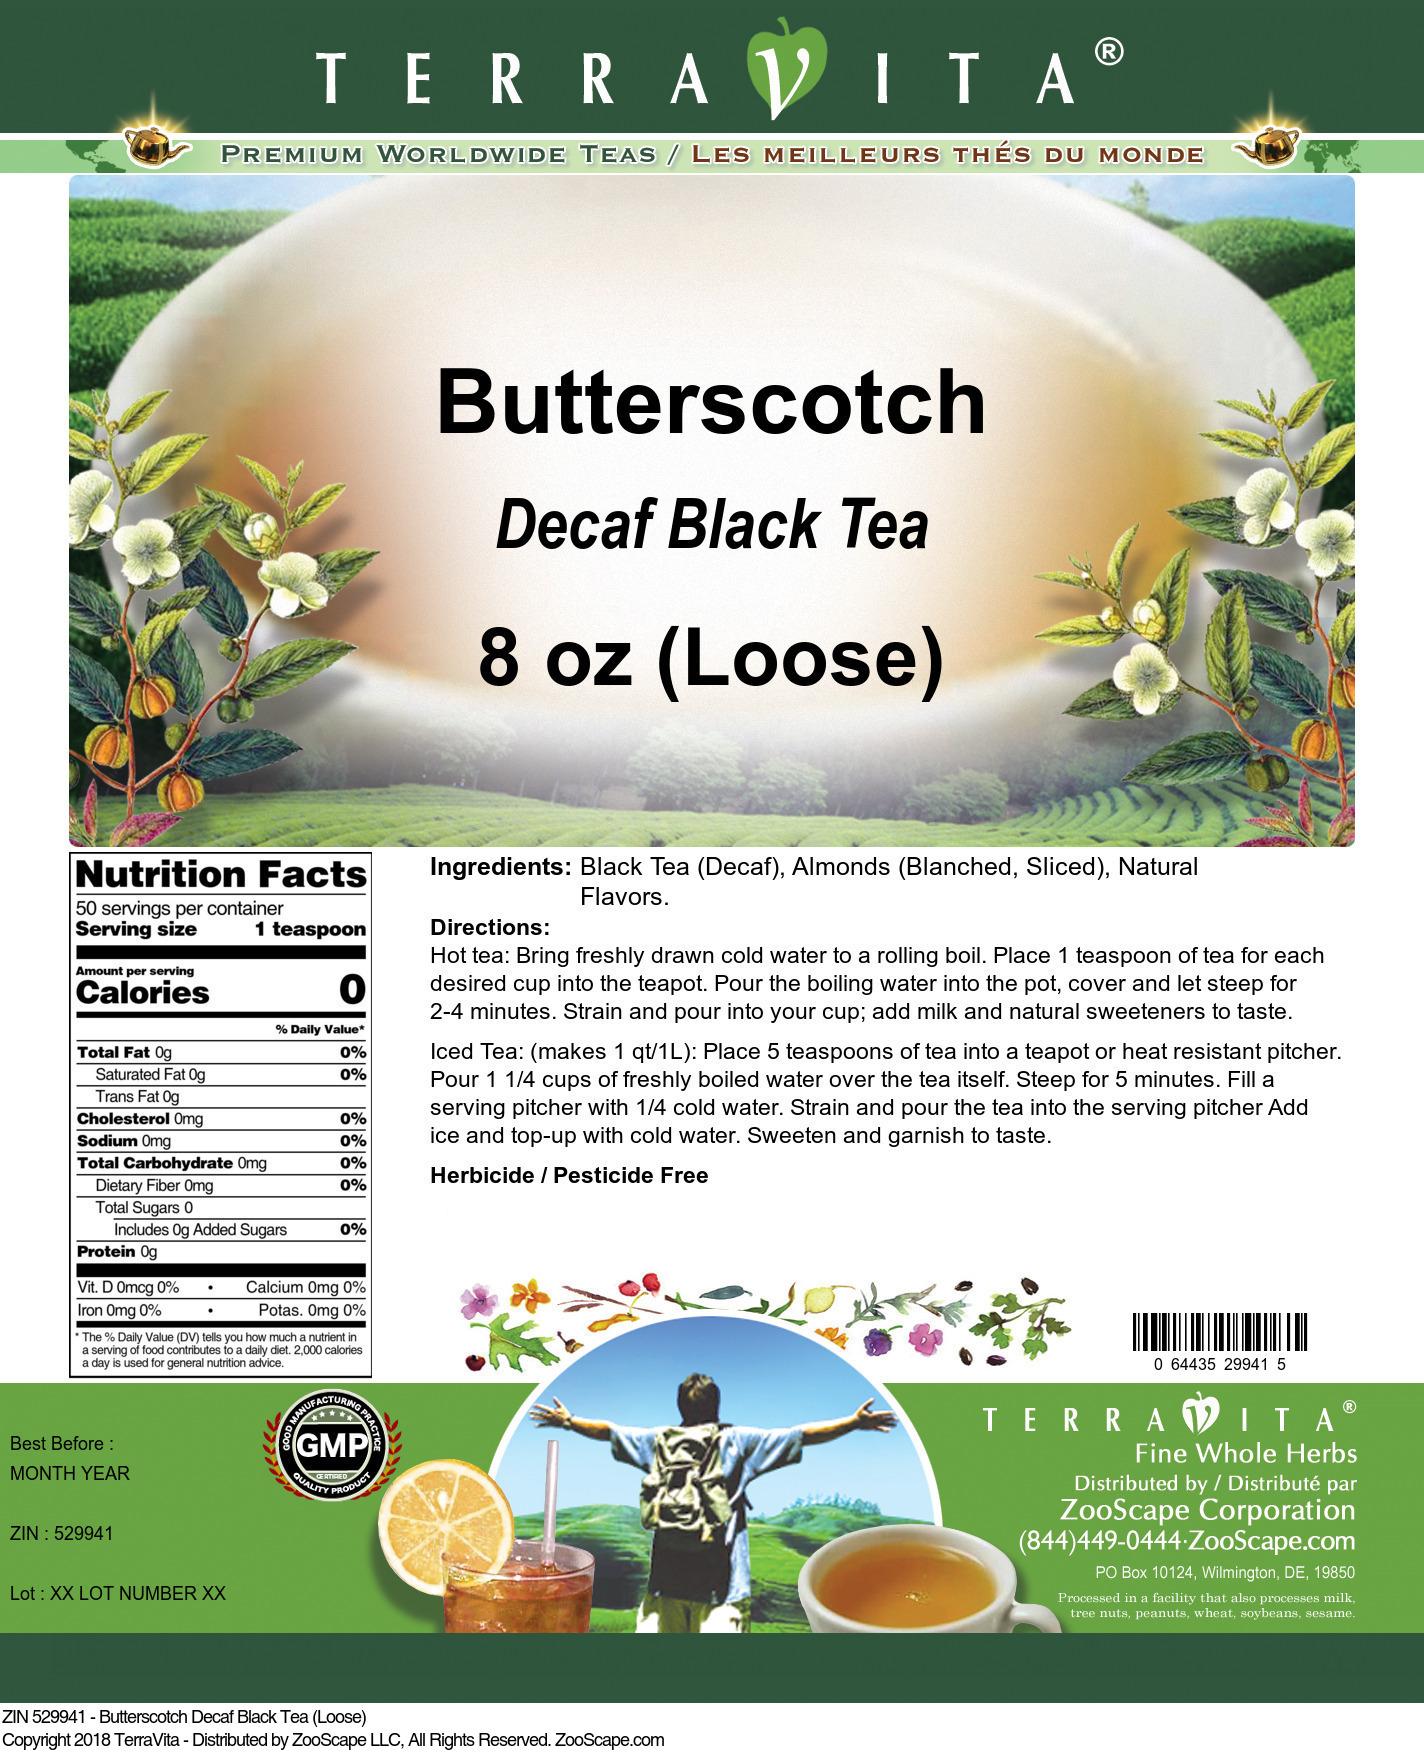 Butterscotch Decaf Black Tea